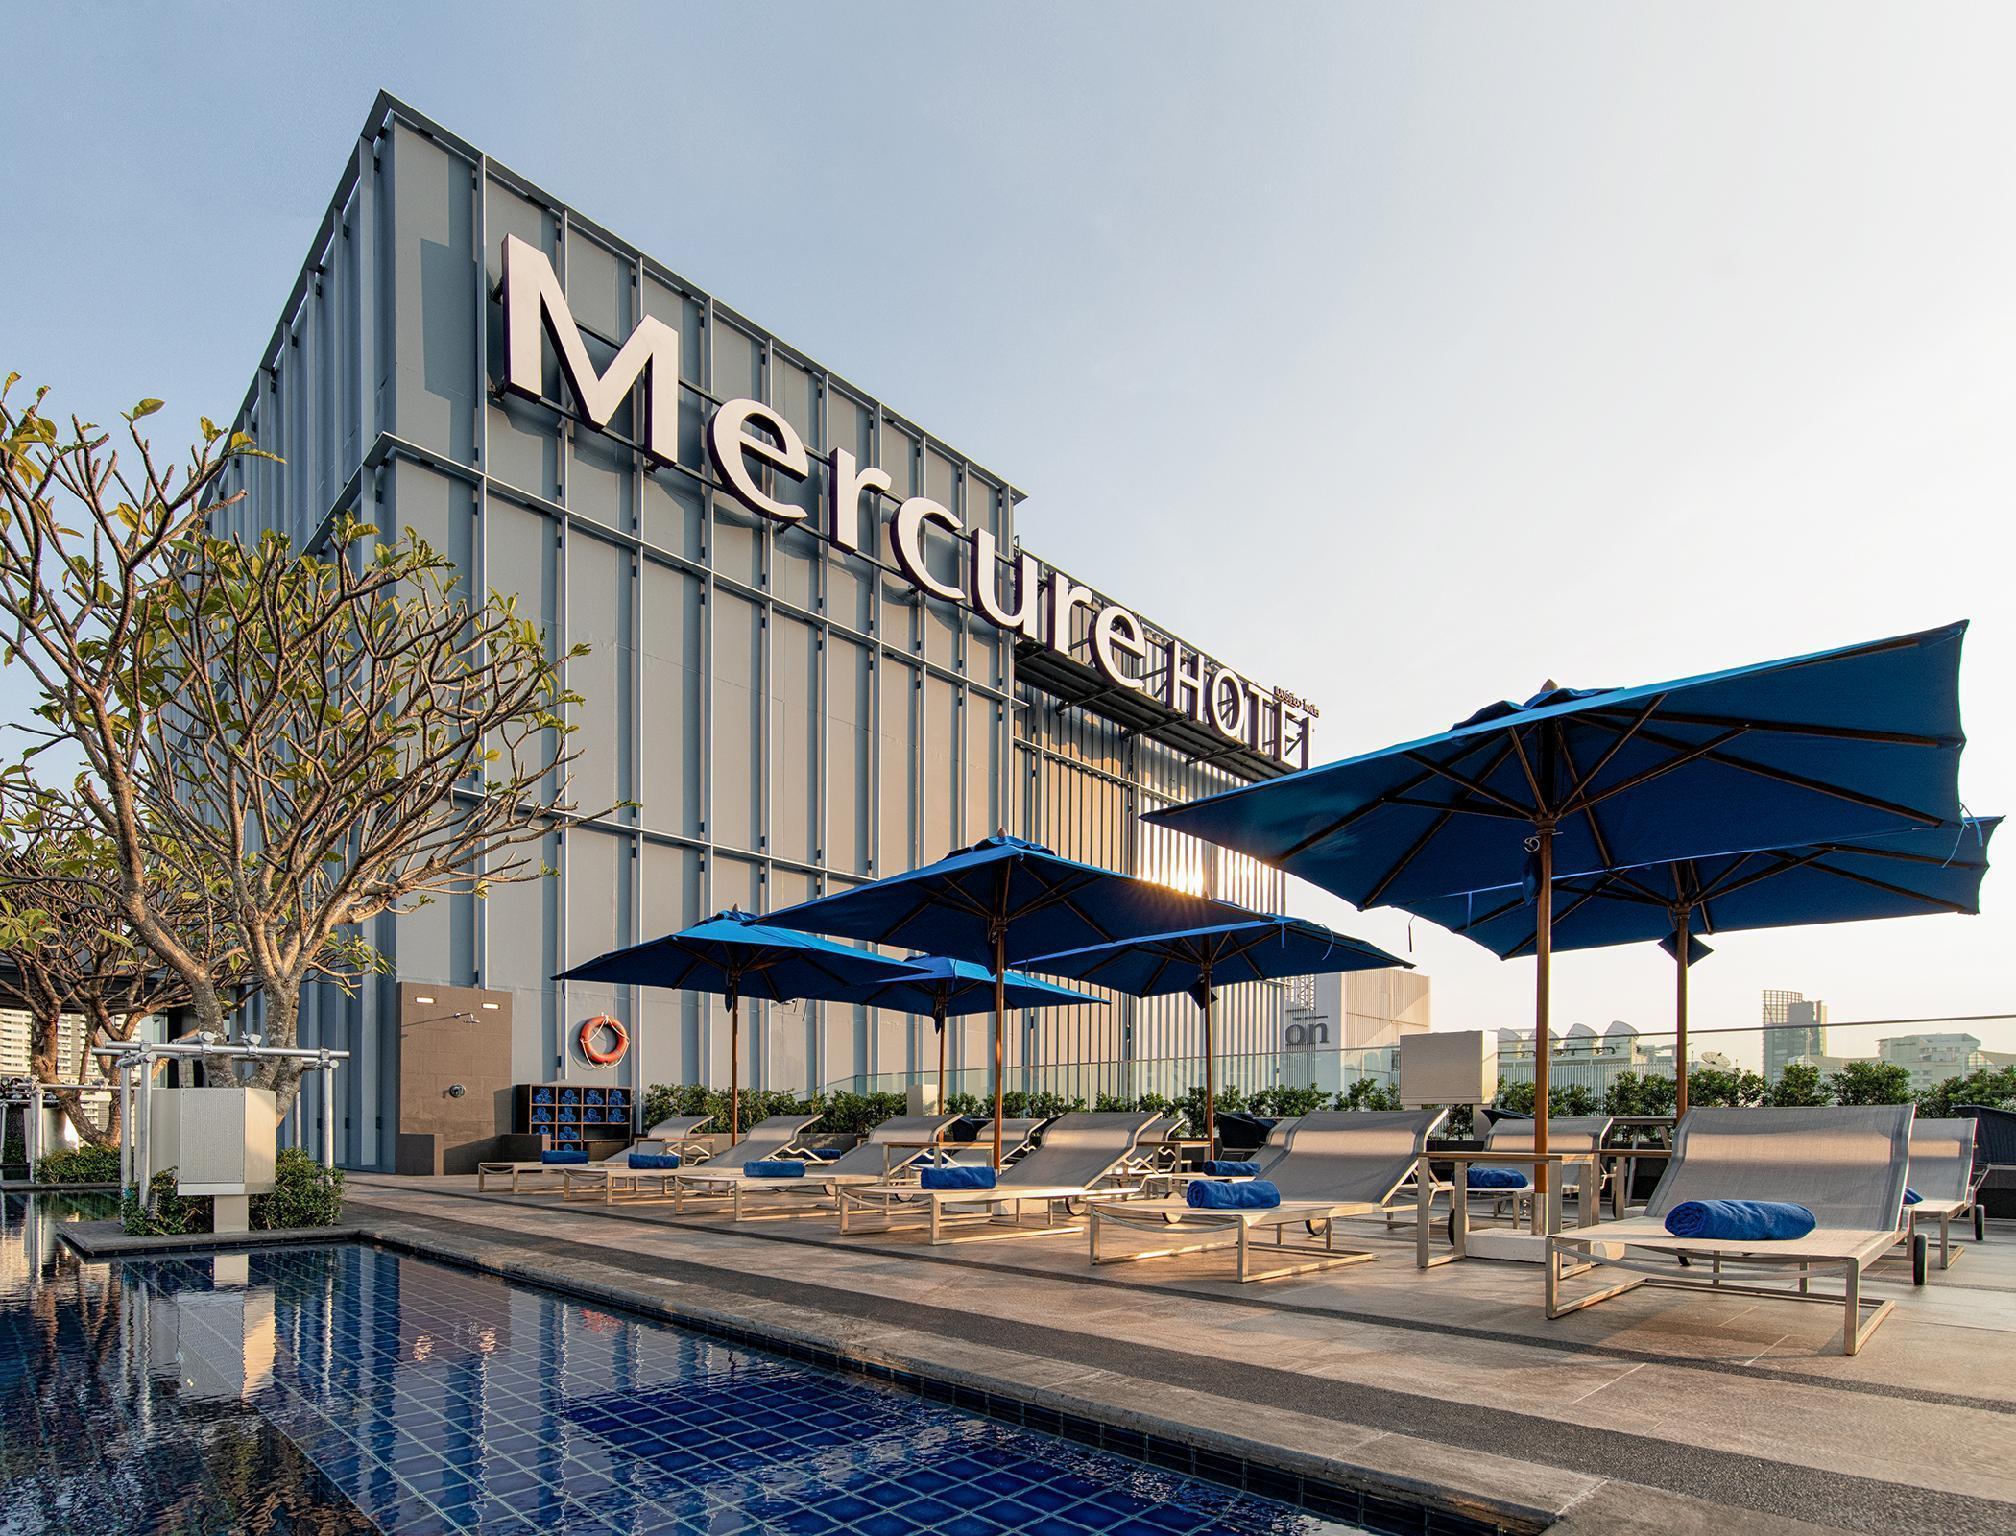 Mercure Bangkok Sukhumvit 24 เมอรืเคียว แบงค็อก สุขุมวิท 24